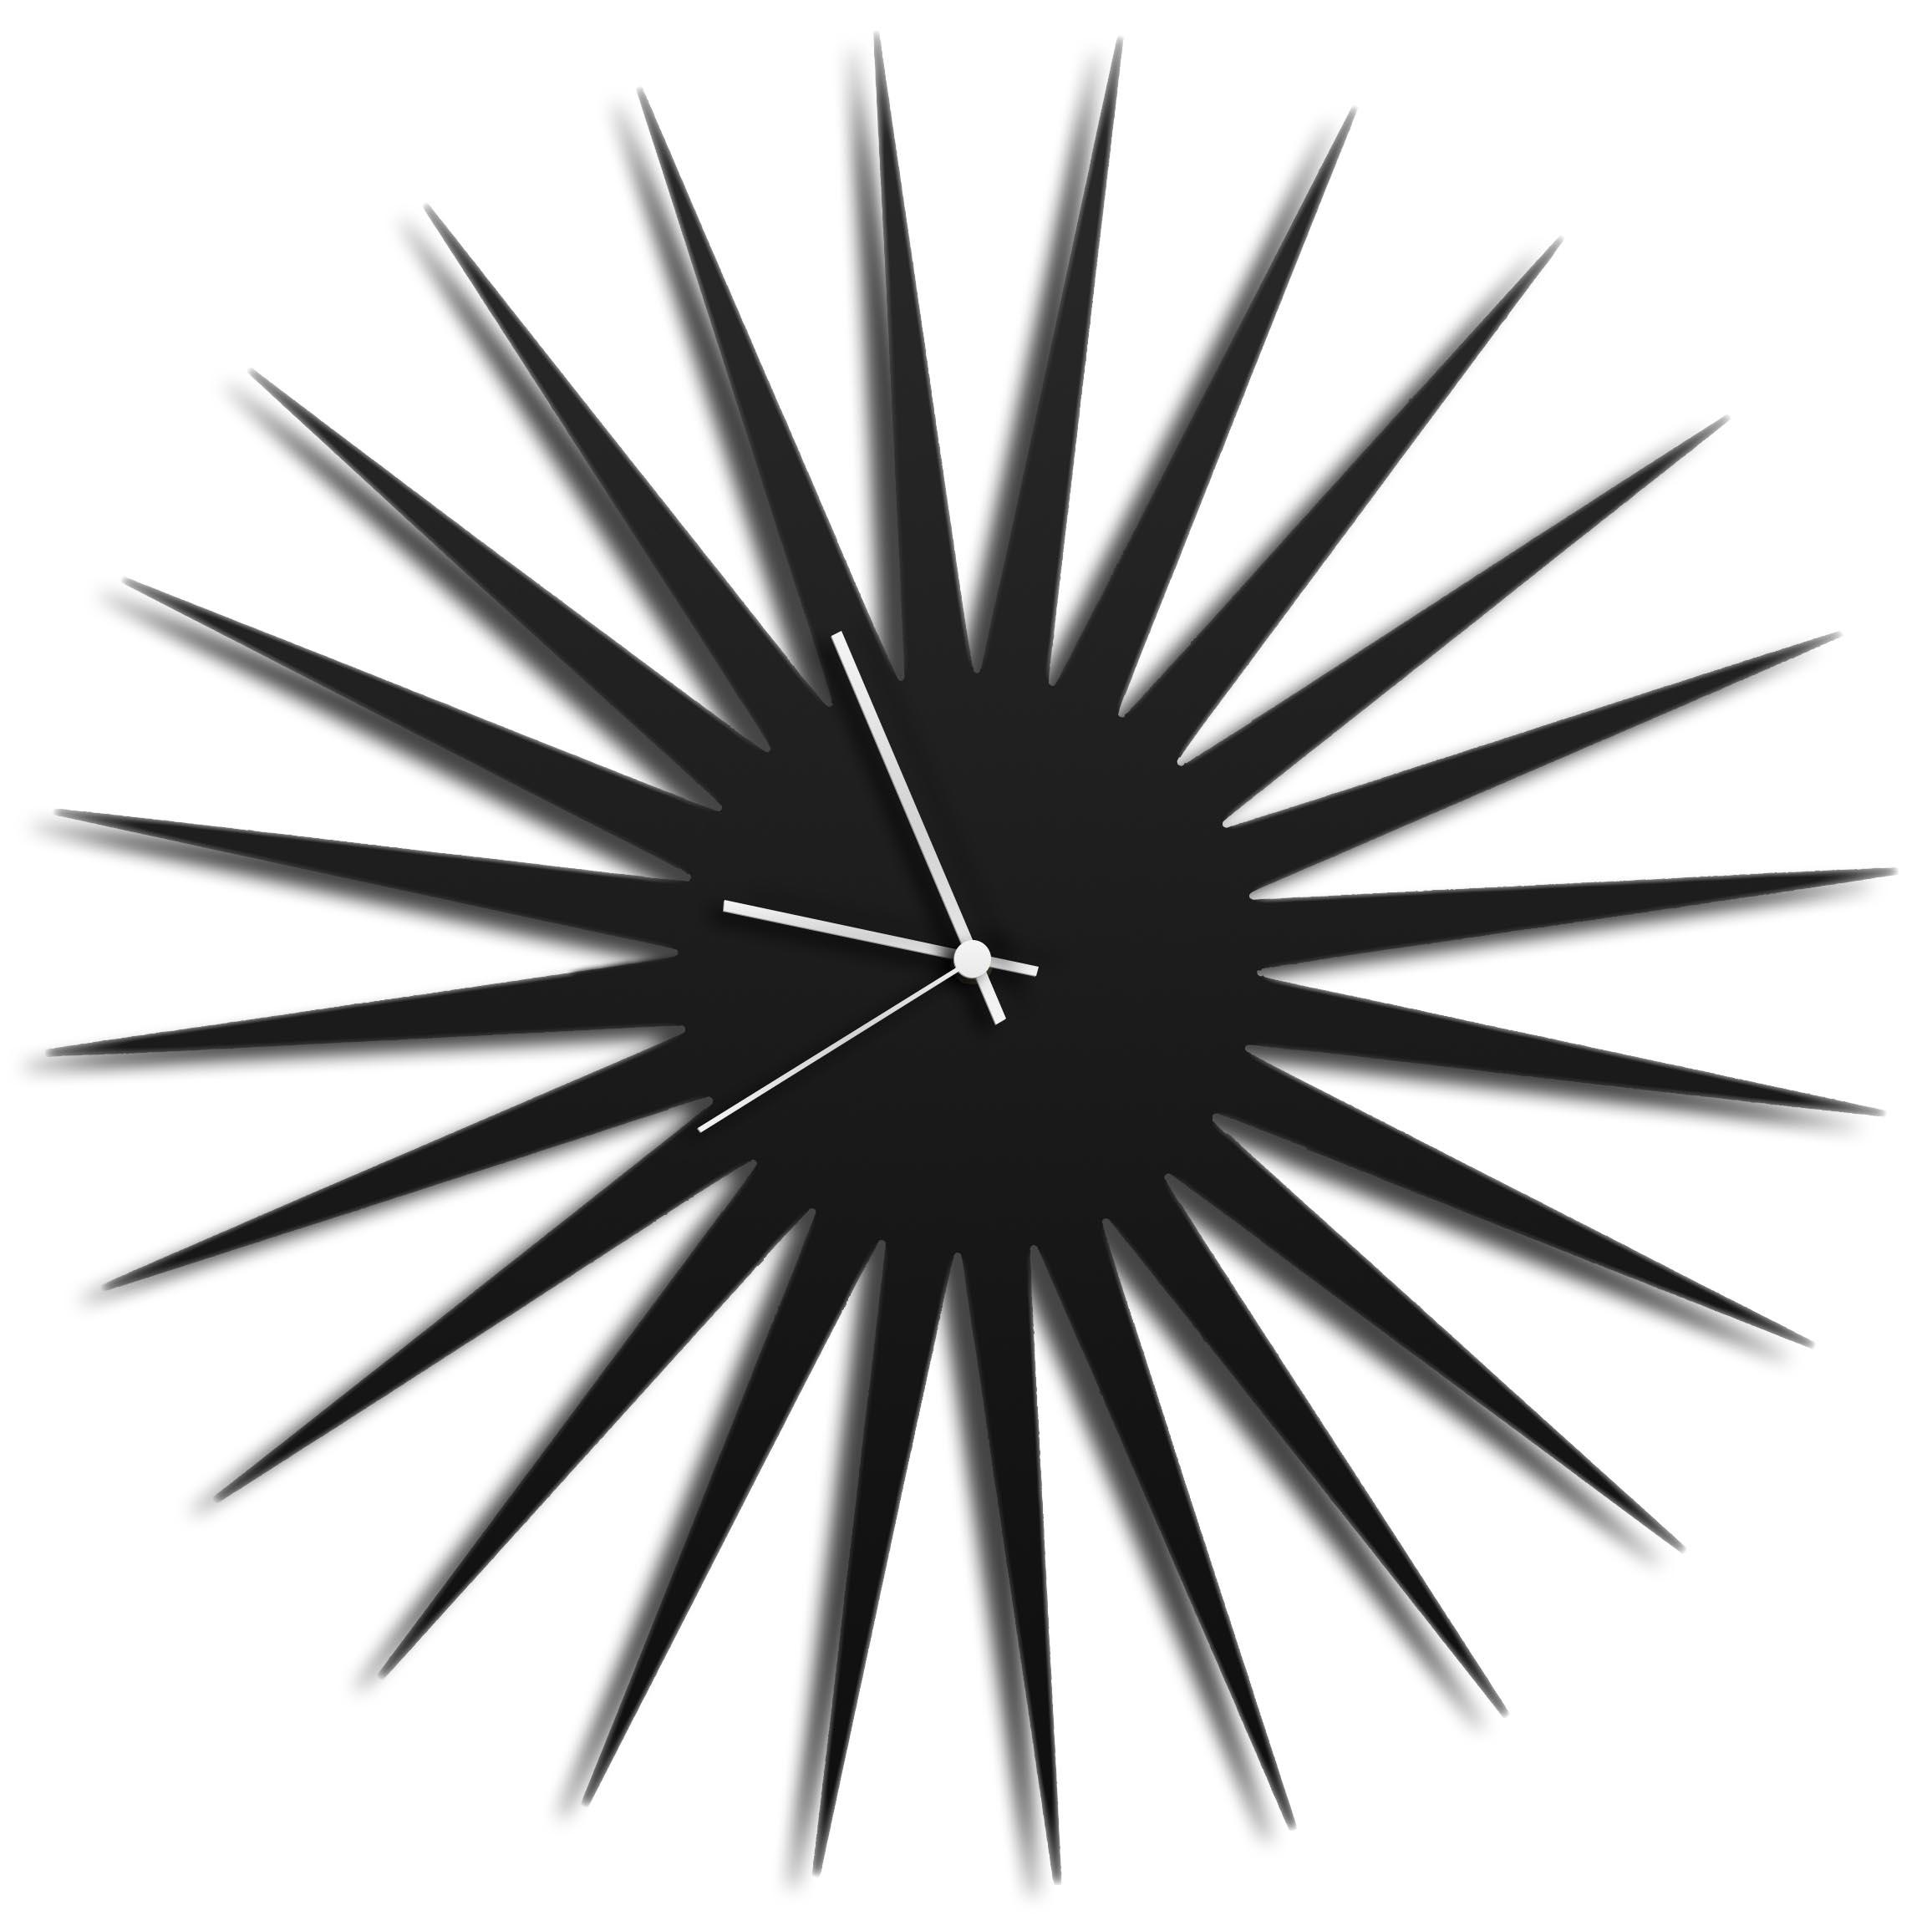 MCM Starburst Clock - Black by Adam Schwoeppe - Midcentury Modern Wall Clock